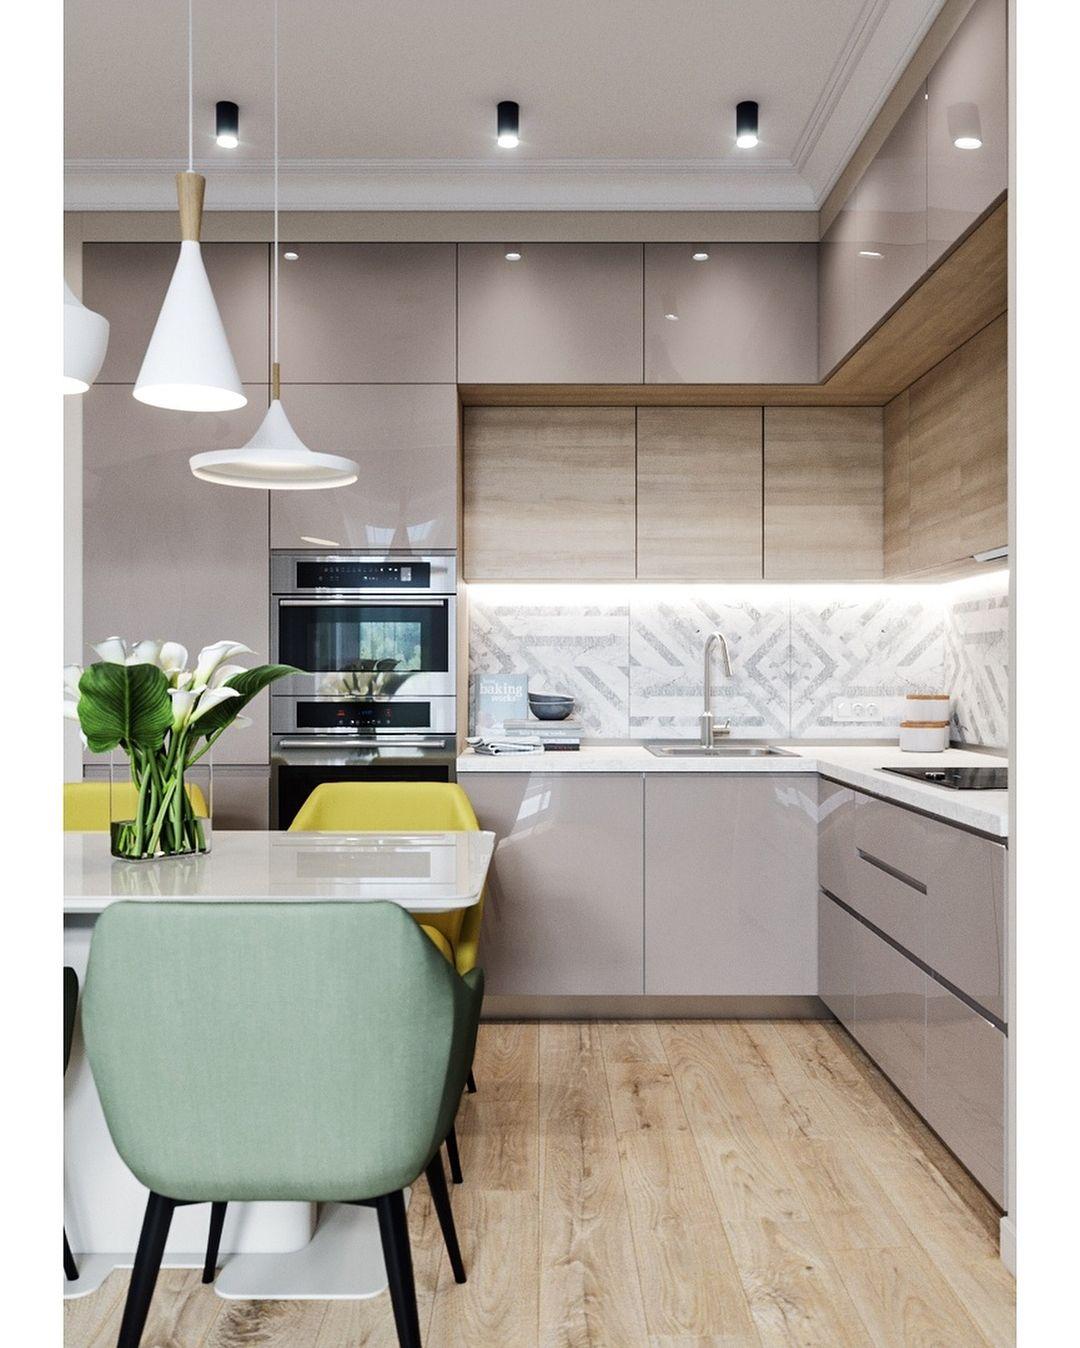 дизайн кухня интерьер